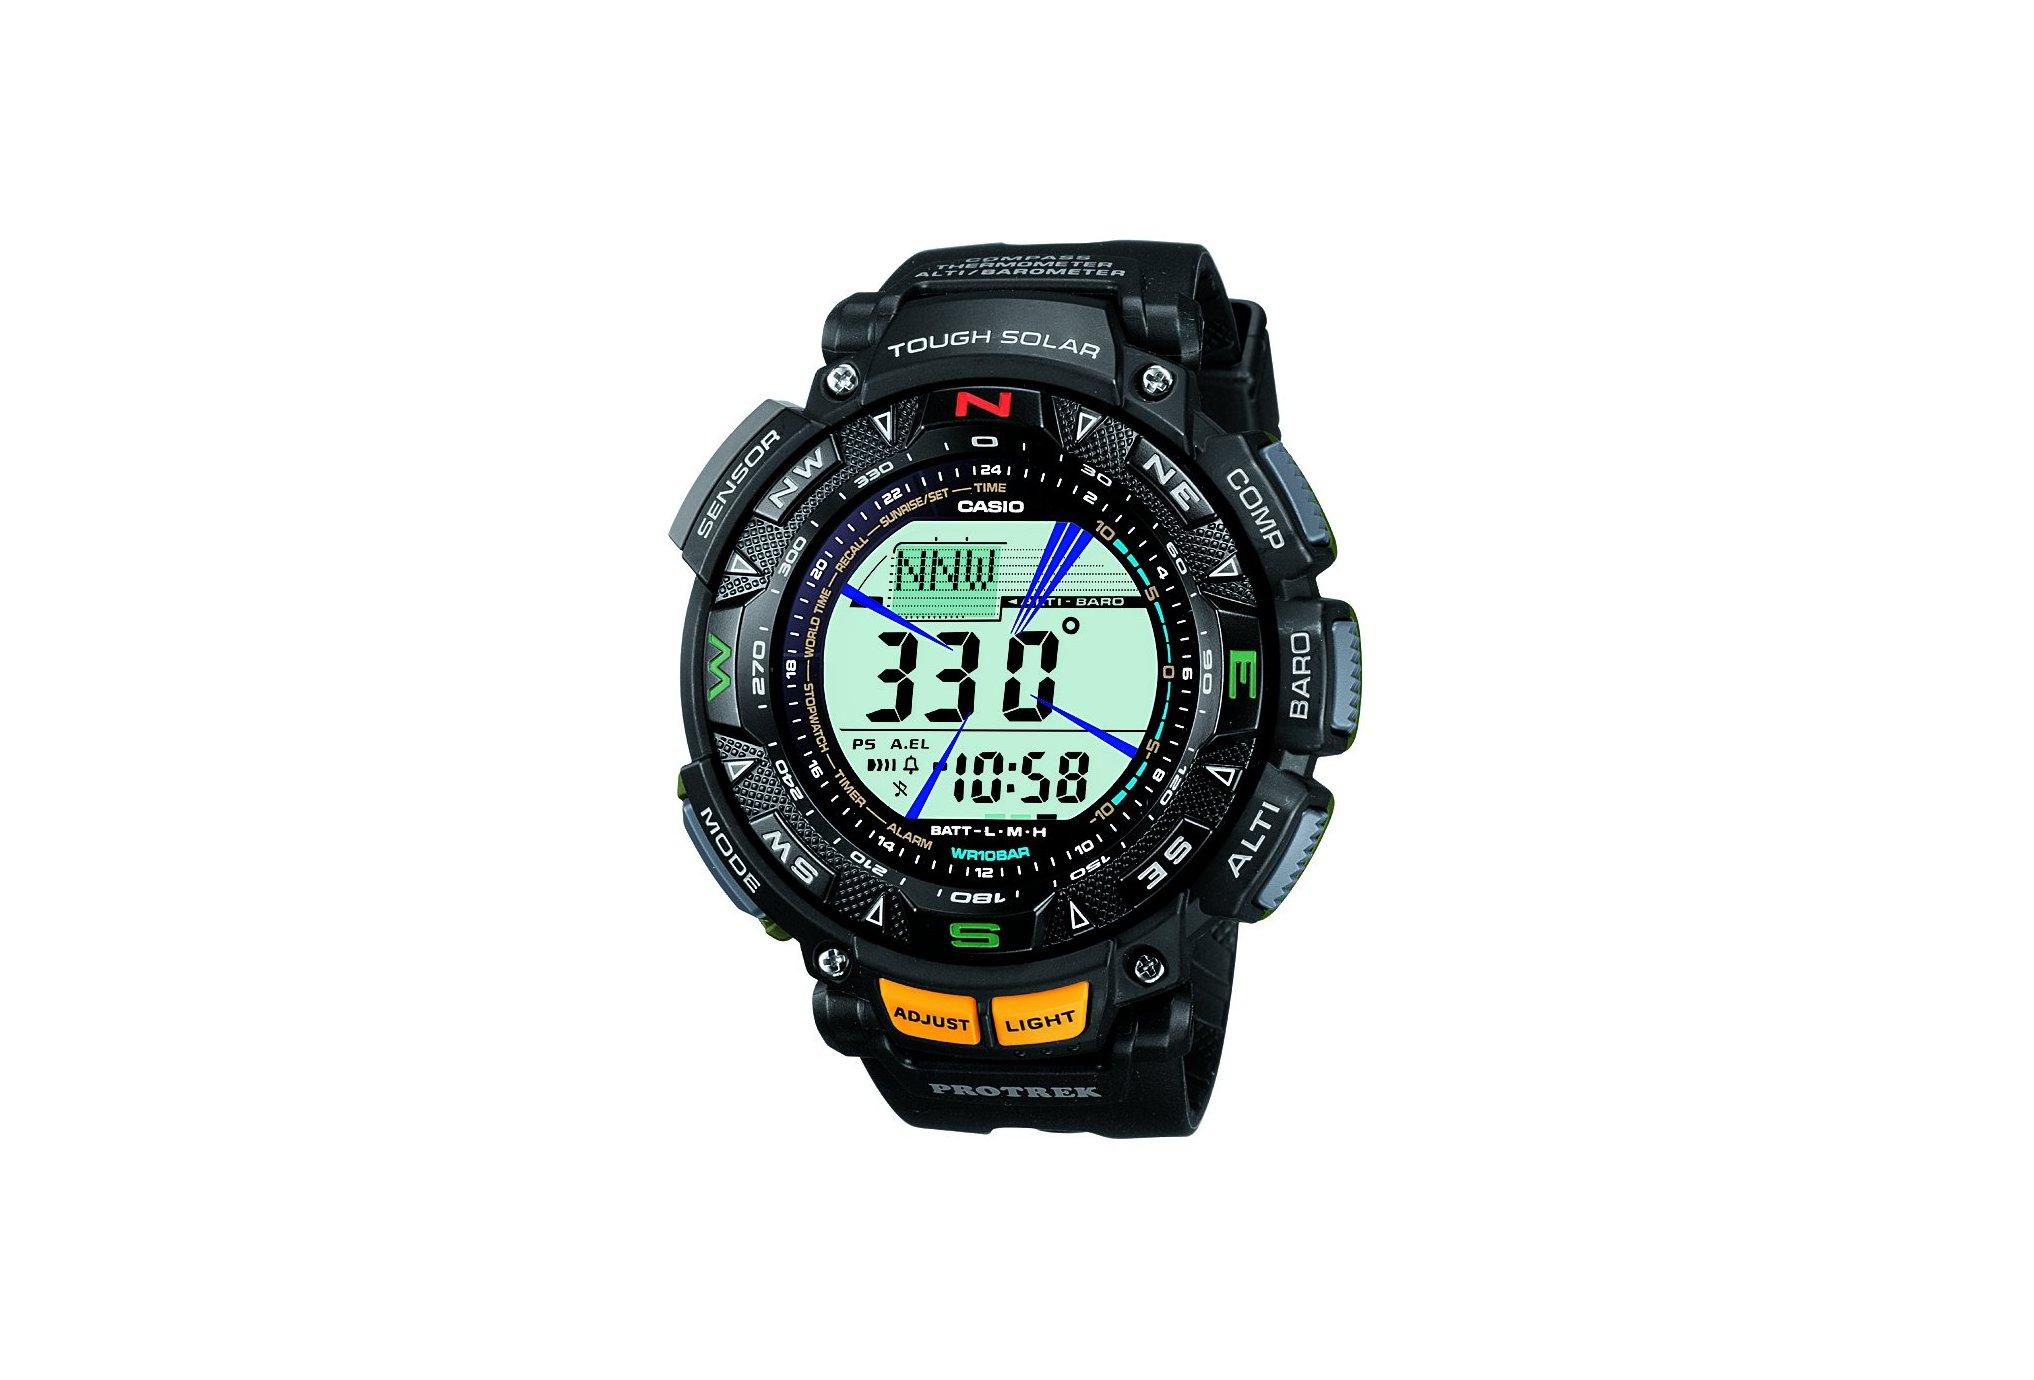 Casio Prg-240 montres de sport